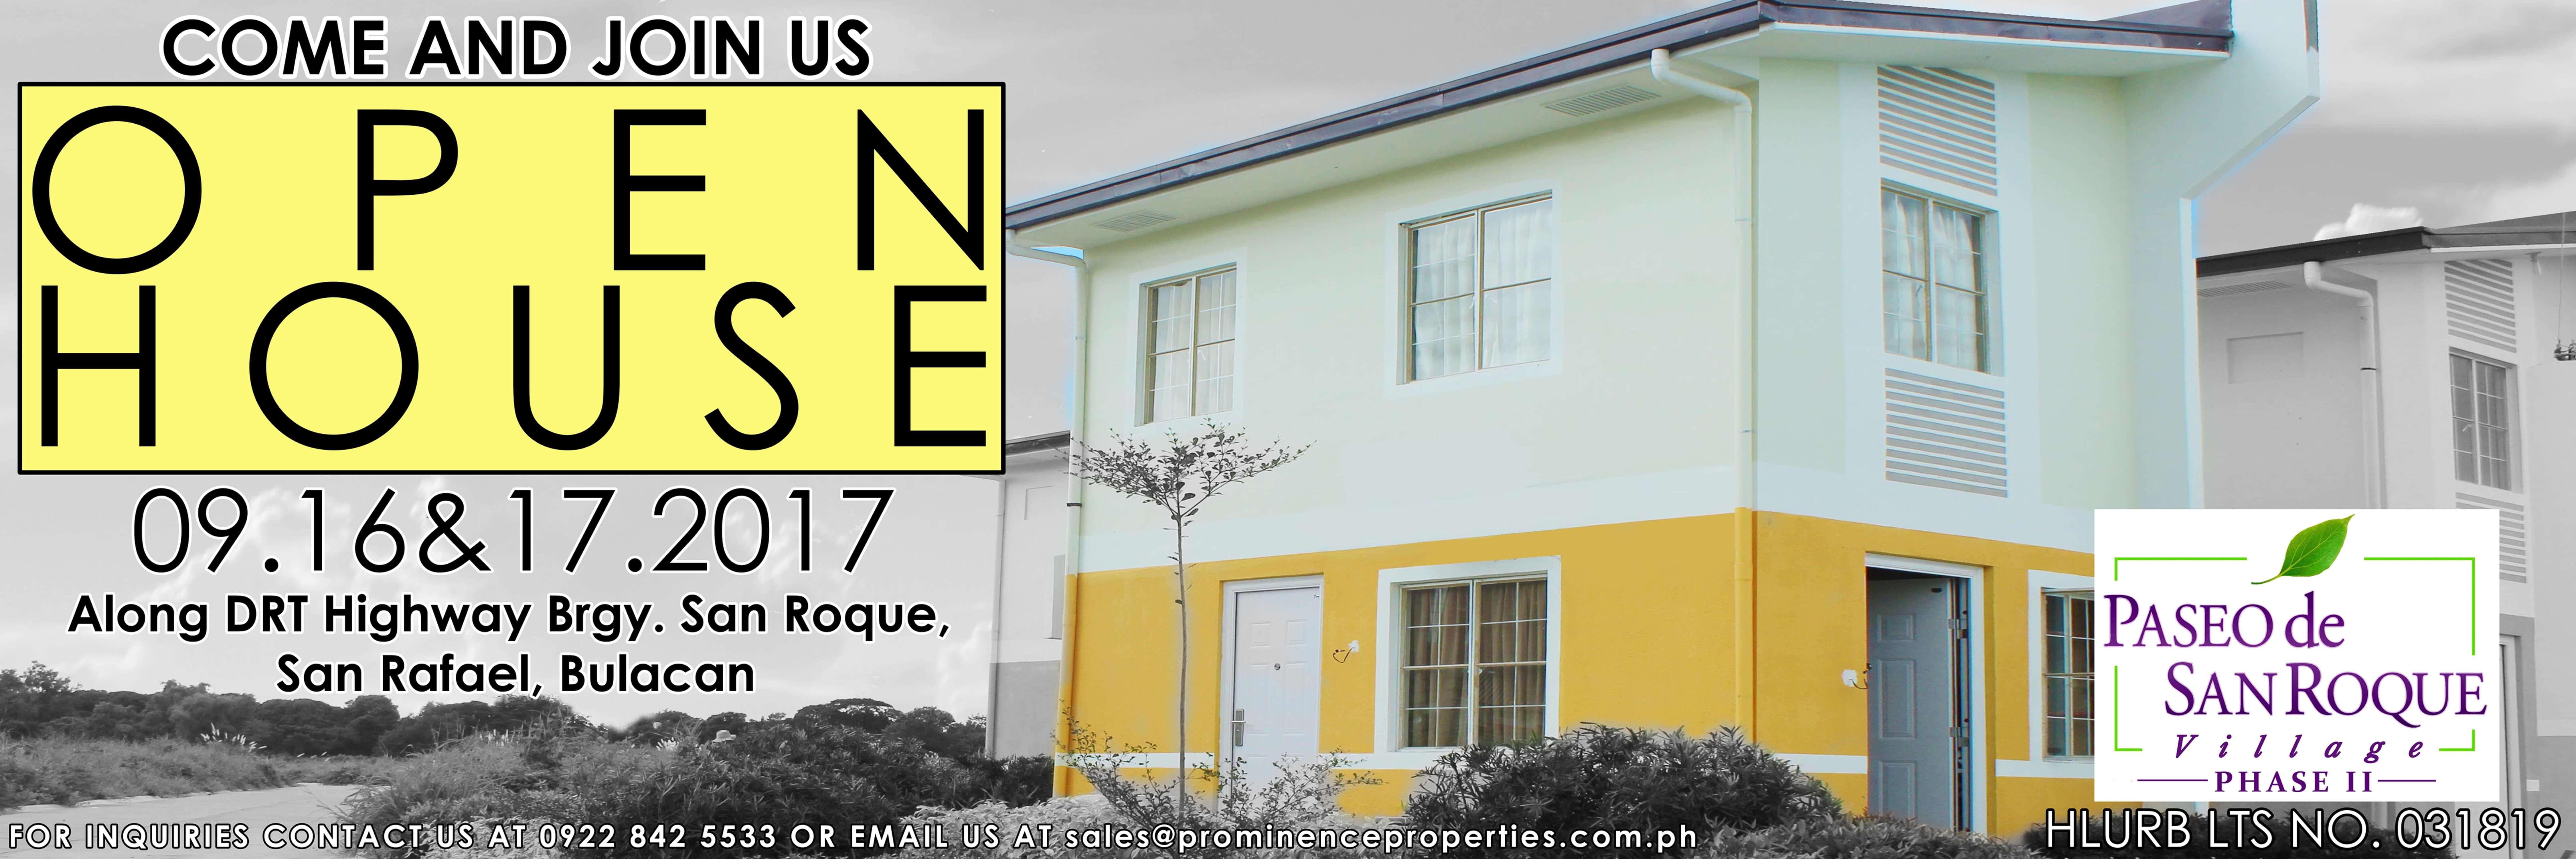 Paseo De San Roque Village Phase 2 Open House